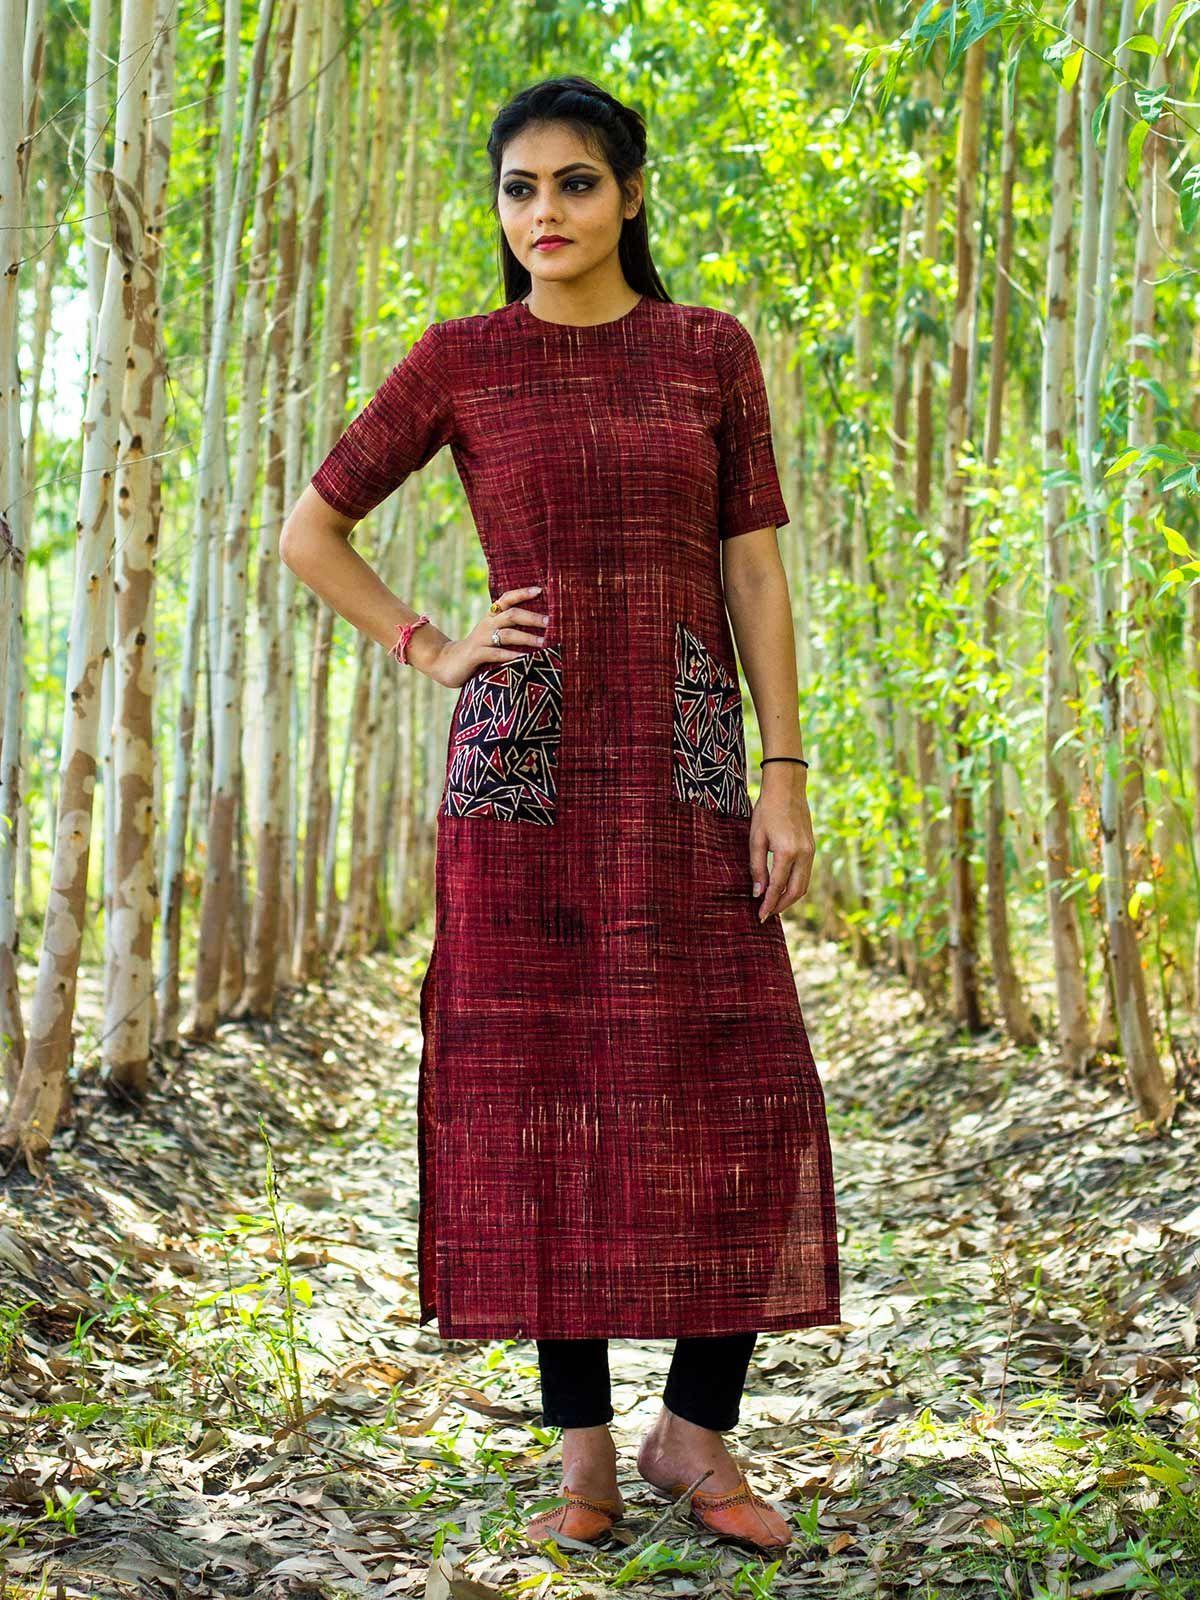 Brick red kurta with black mushru pockets